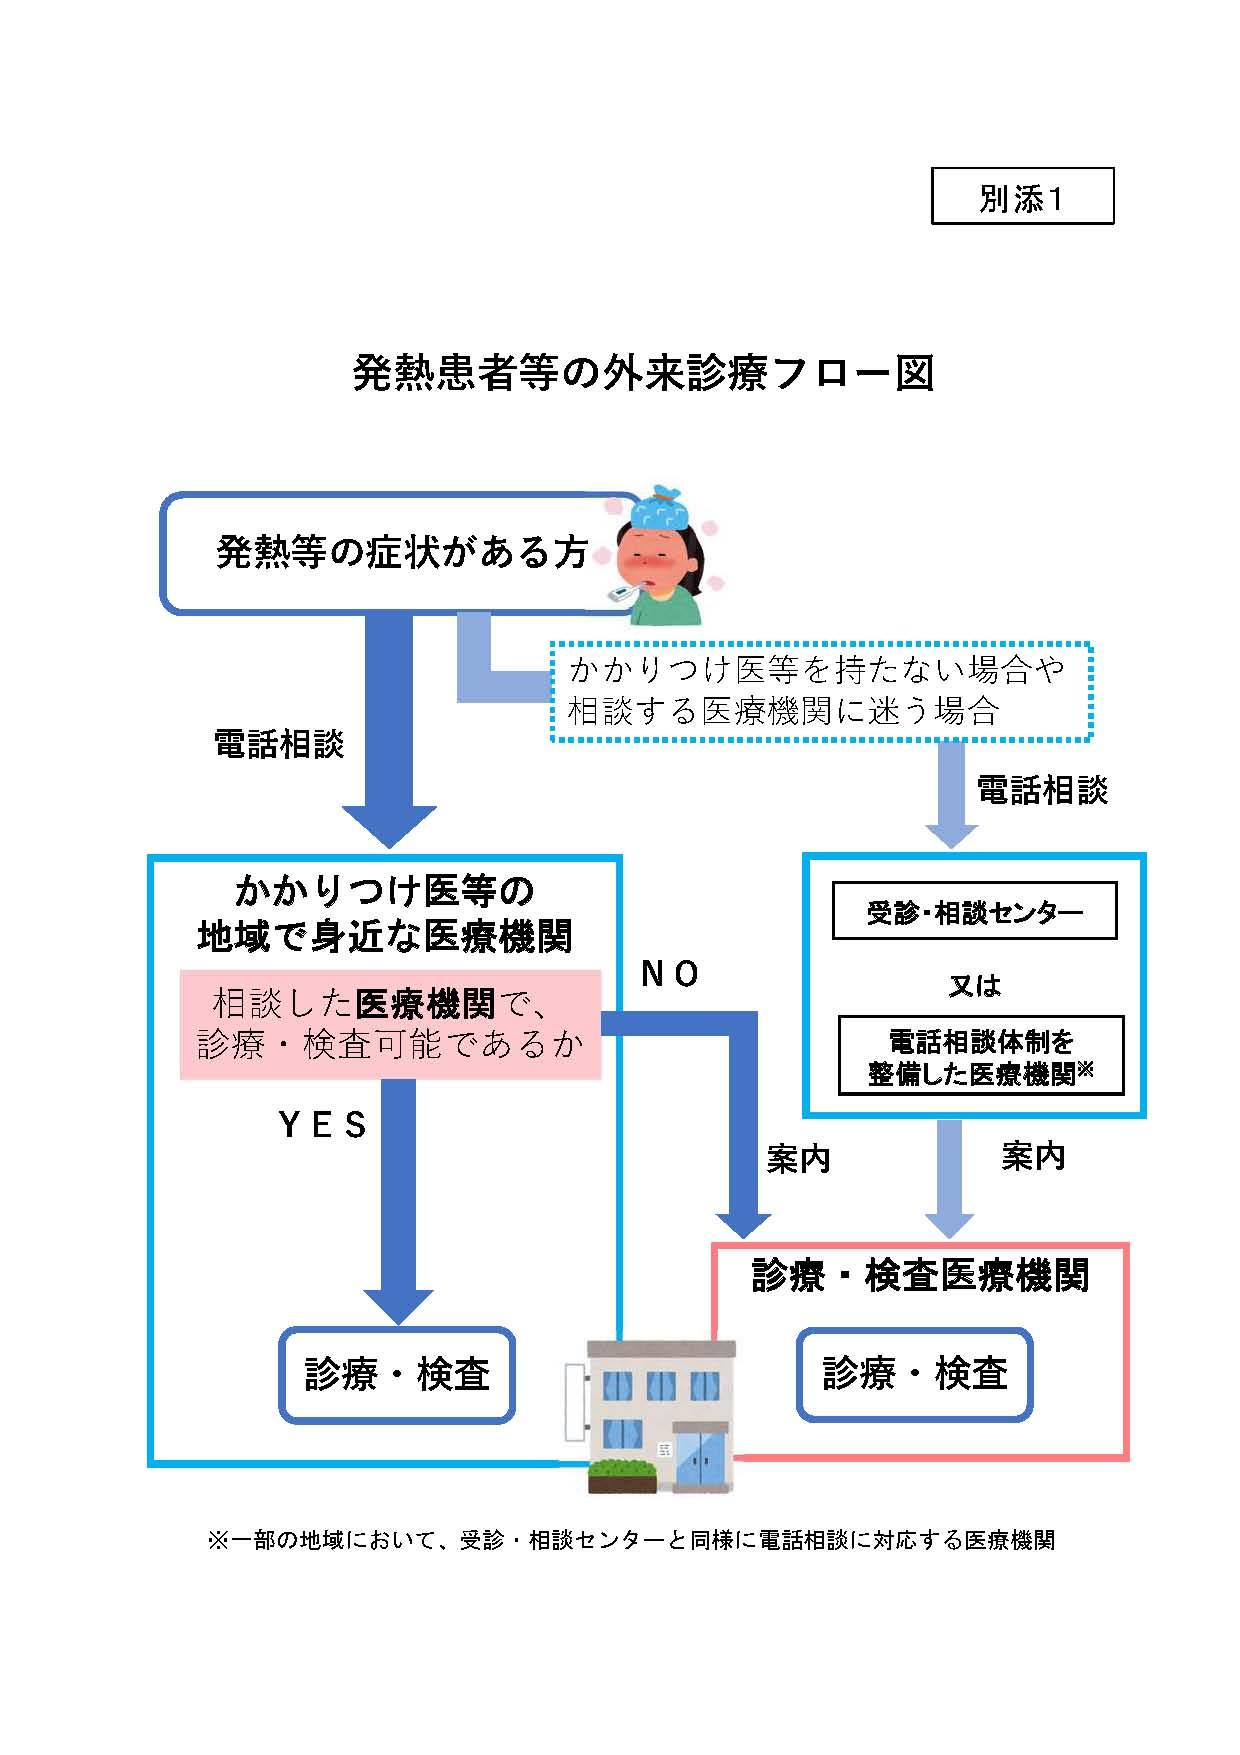 コロナ 愛知 県 数 感染 者 別 市町村